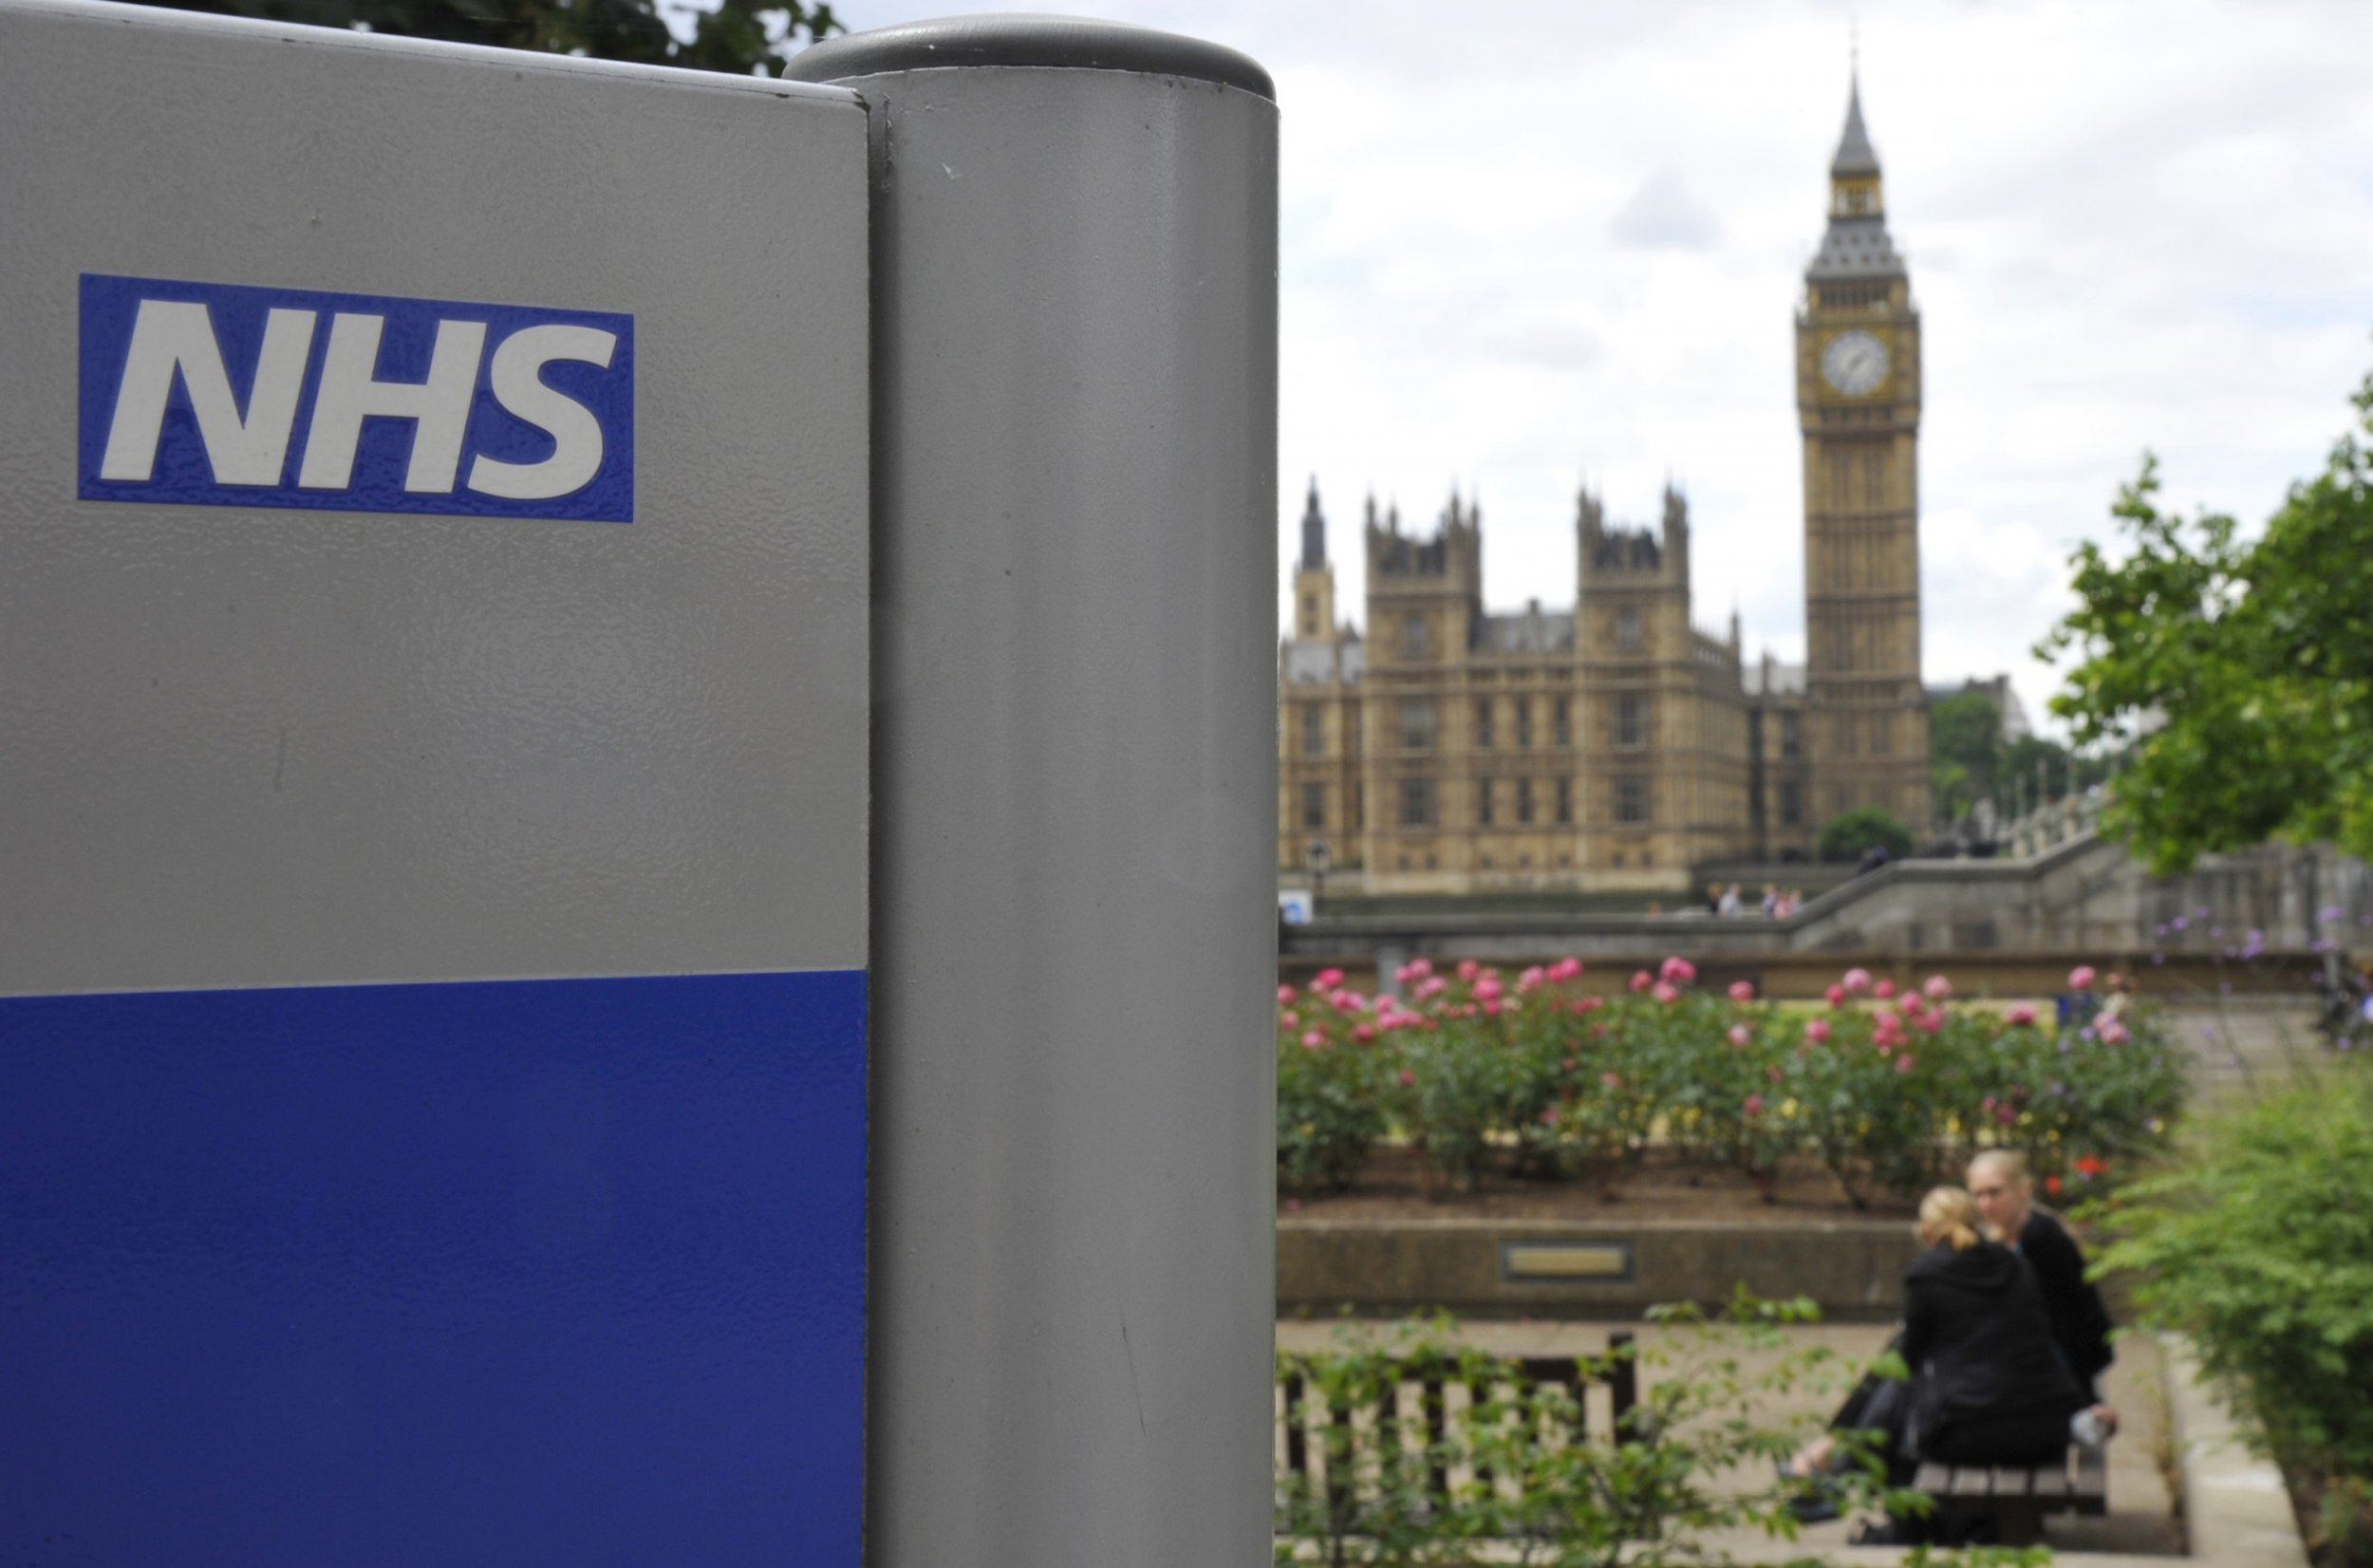 NHS Google cyberattack botnet internet